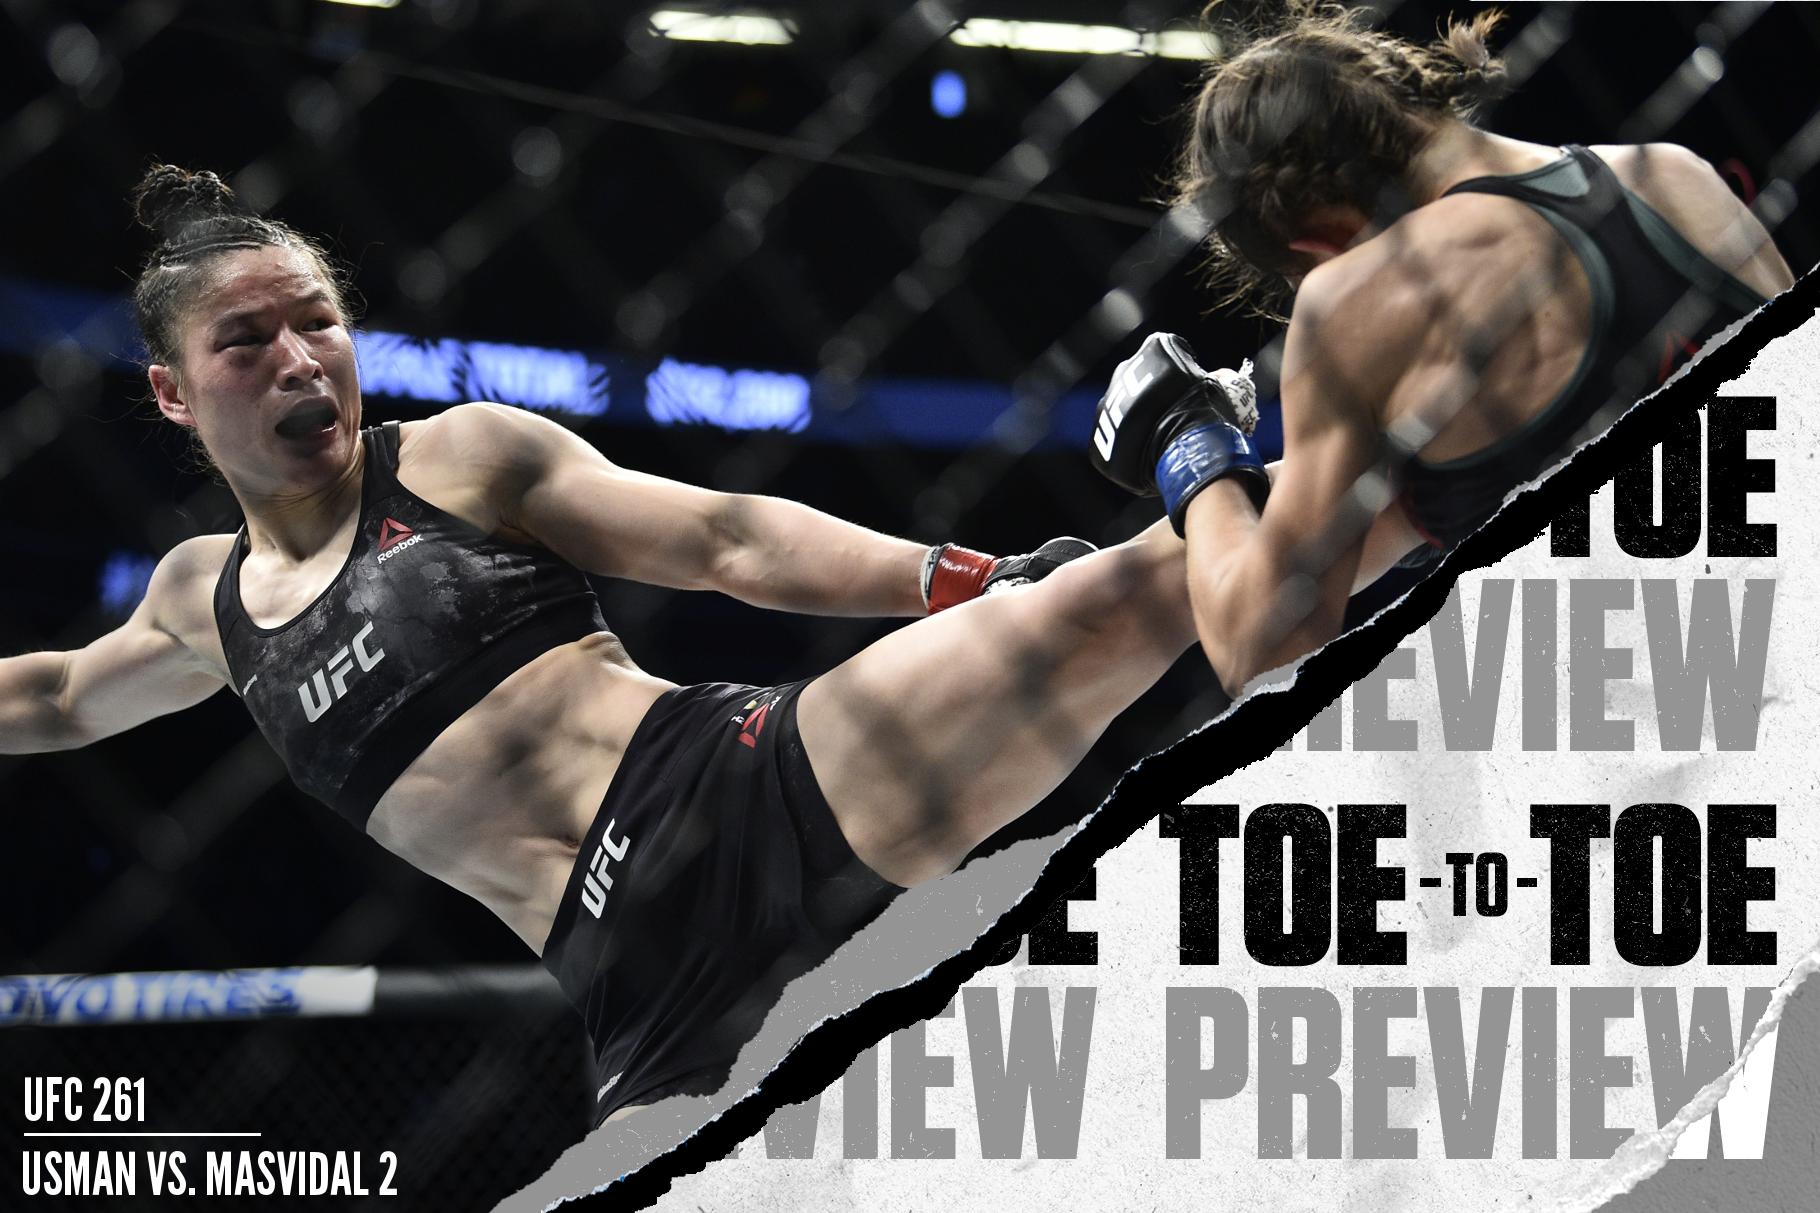 Strawweight champion Zhang Weili (left) kicks Joanna Jedrzejczyk (right) at UFC 248.